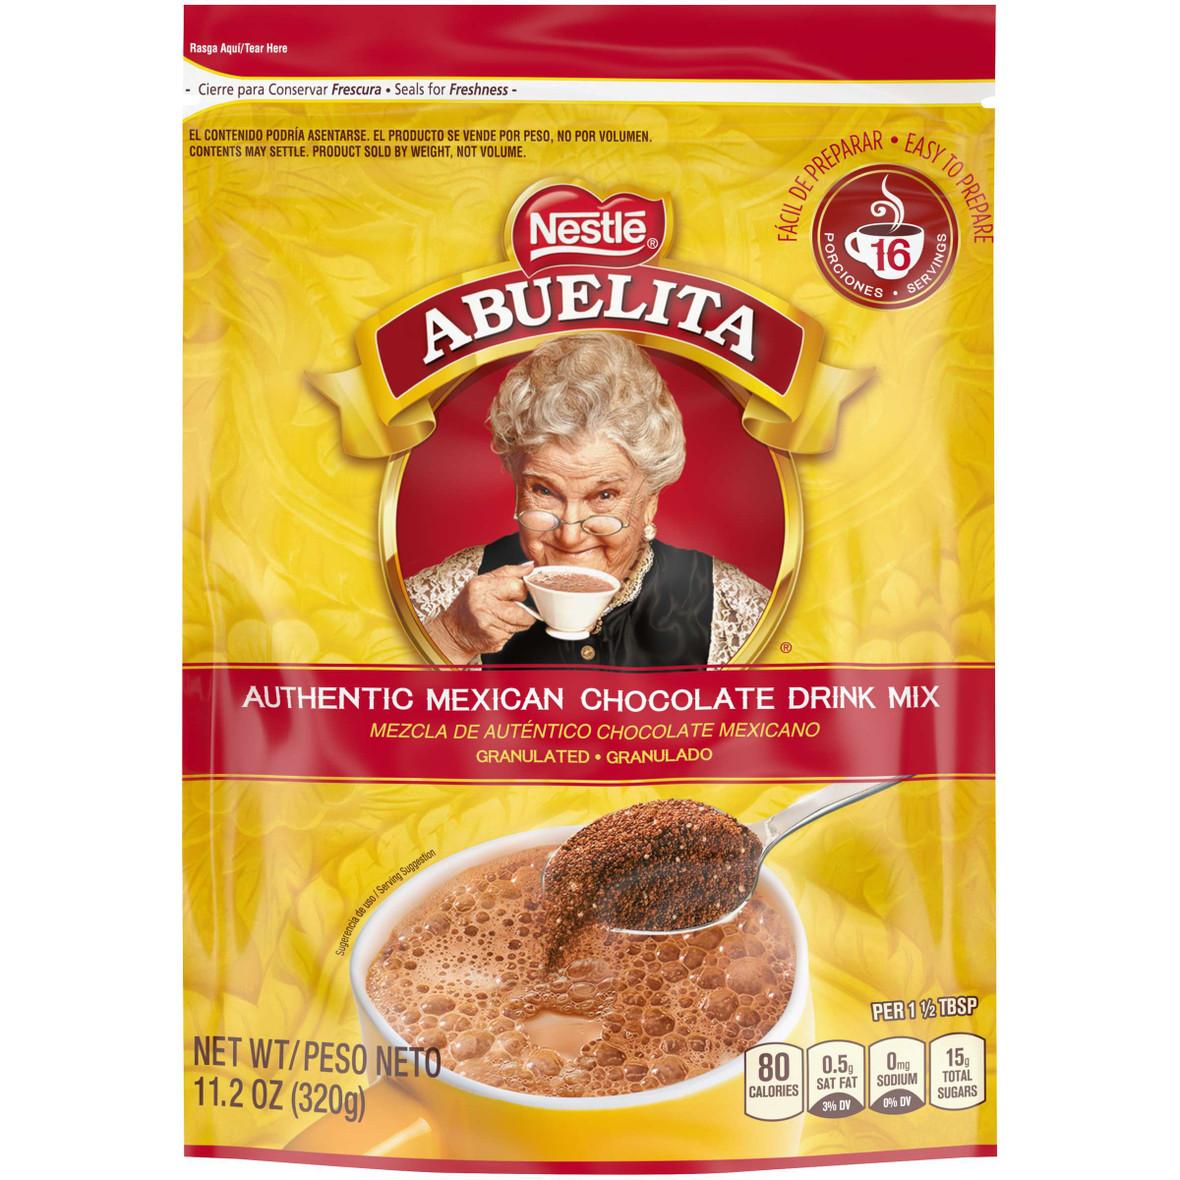 Nestle Abuelita Authentic Granulated Hot Chocolate Drink Mix